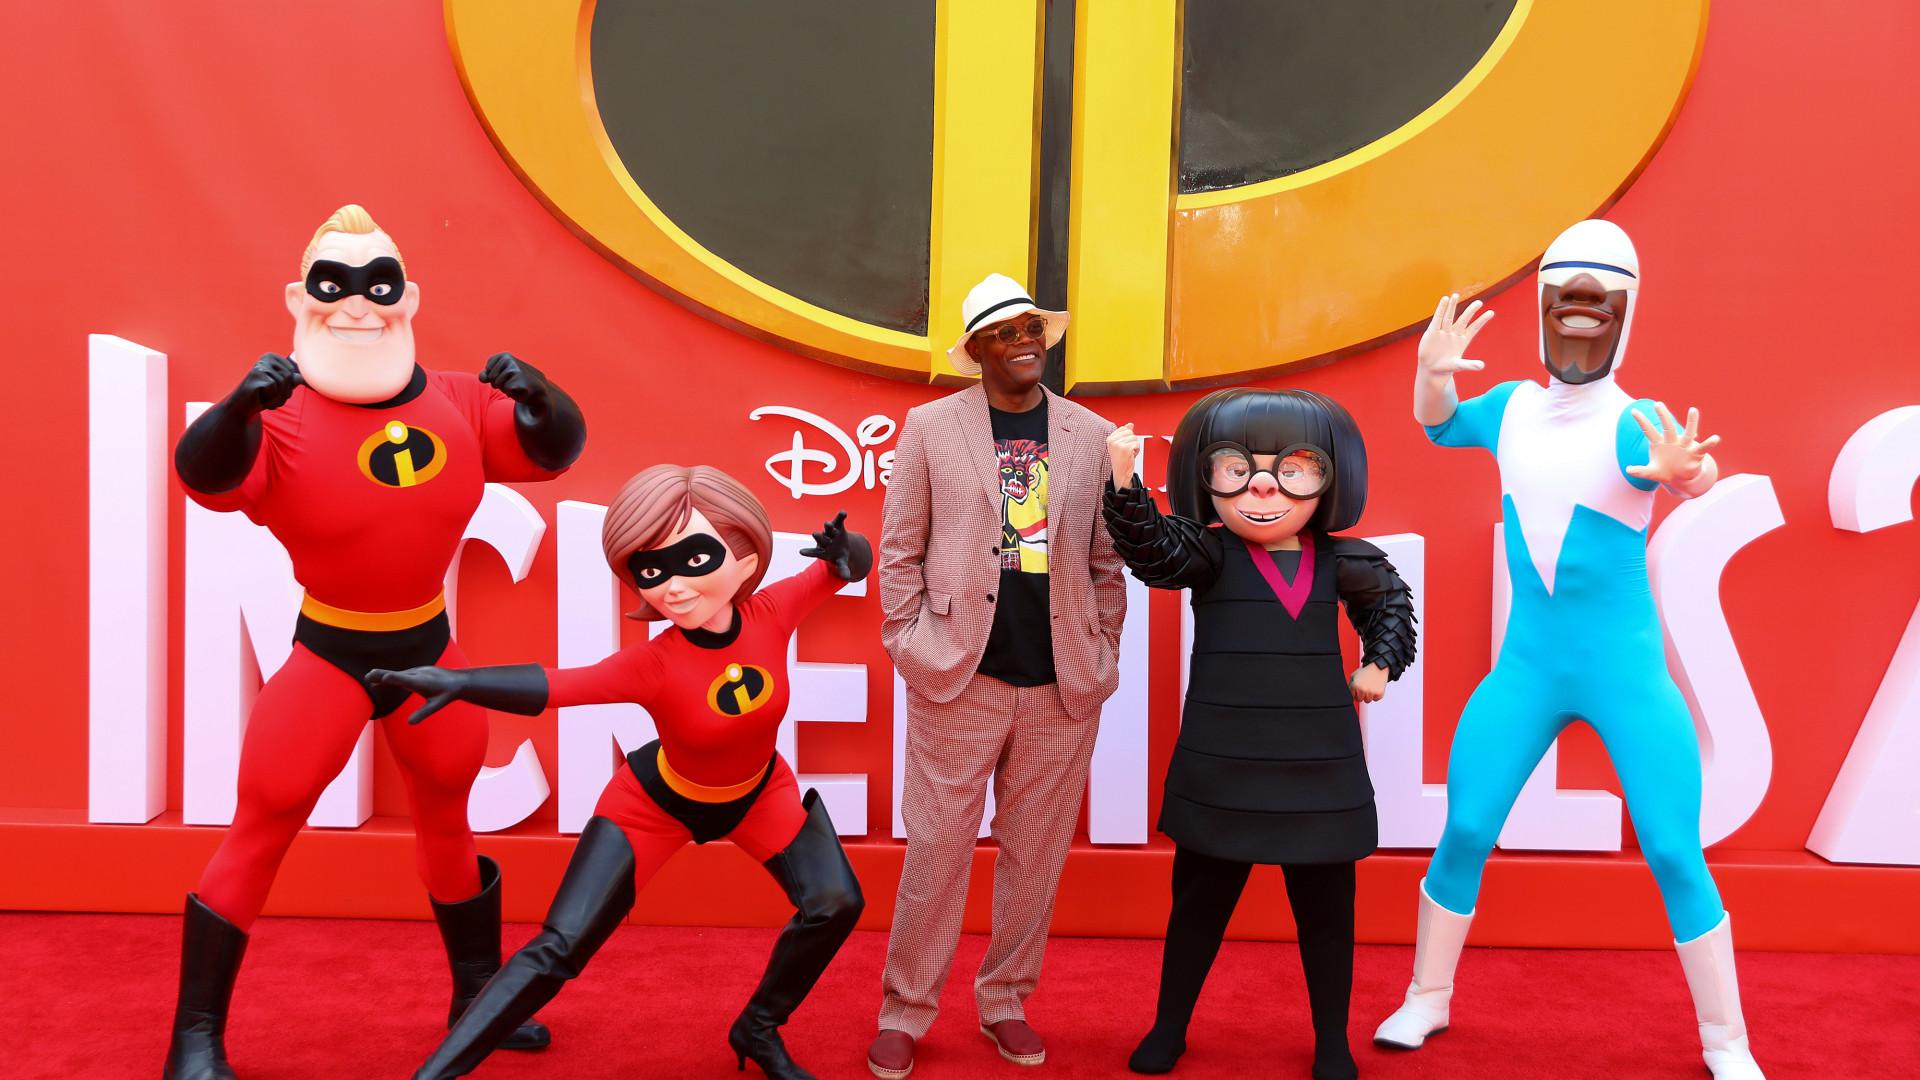 Box-office: Estes super-heróis já lideram há duas 'incríveis' semanas